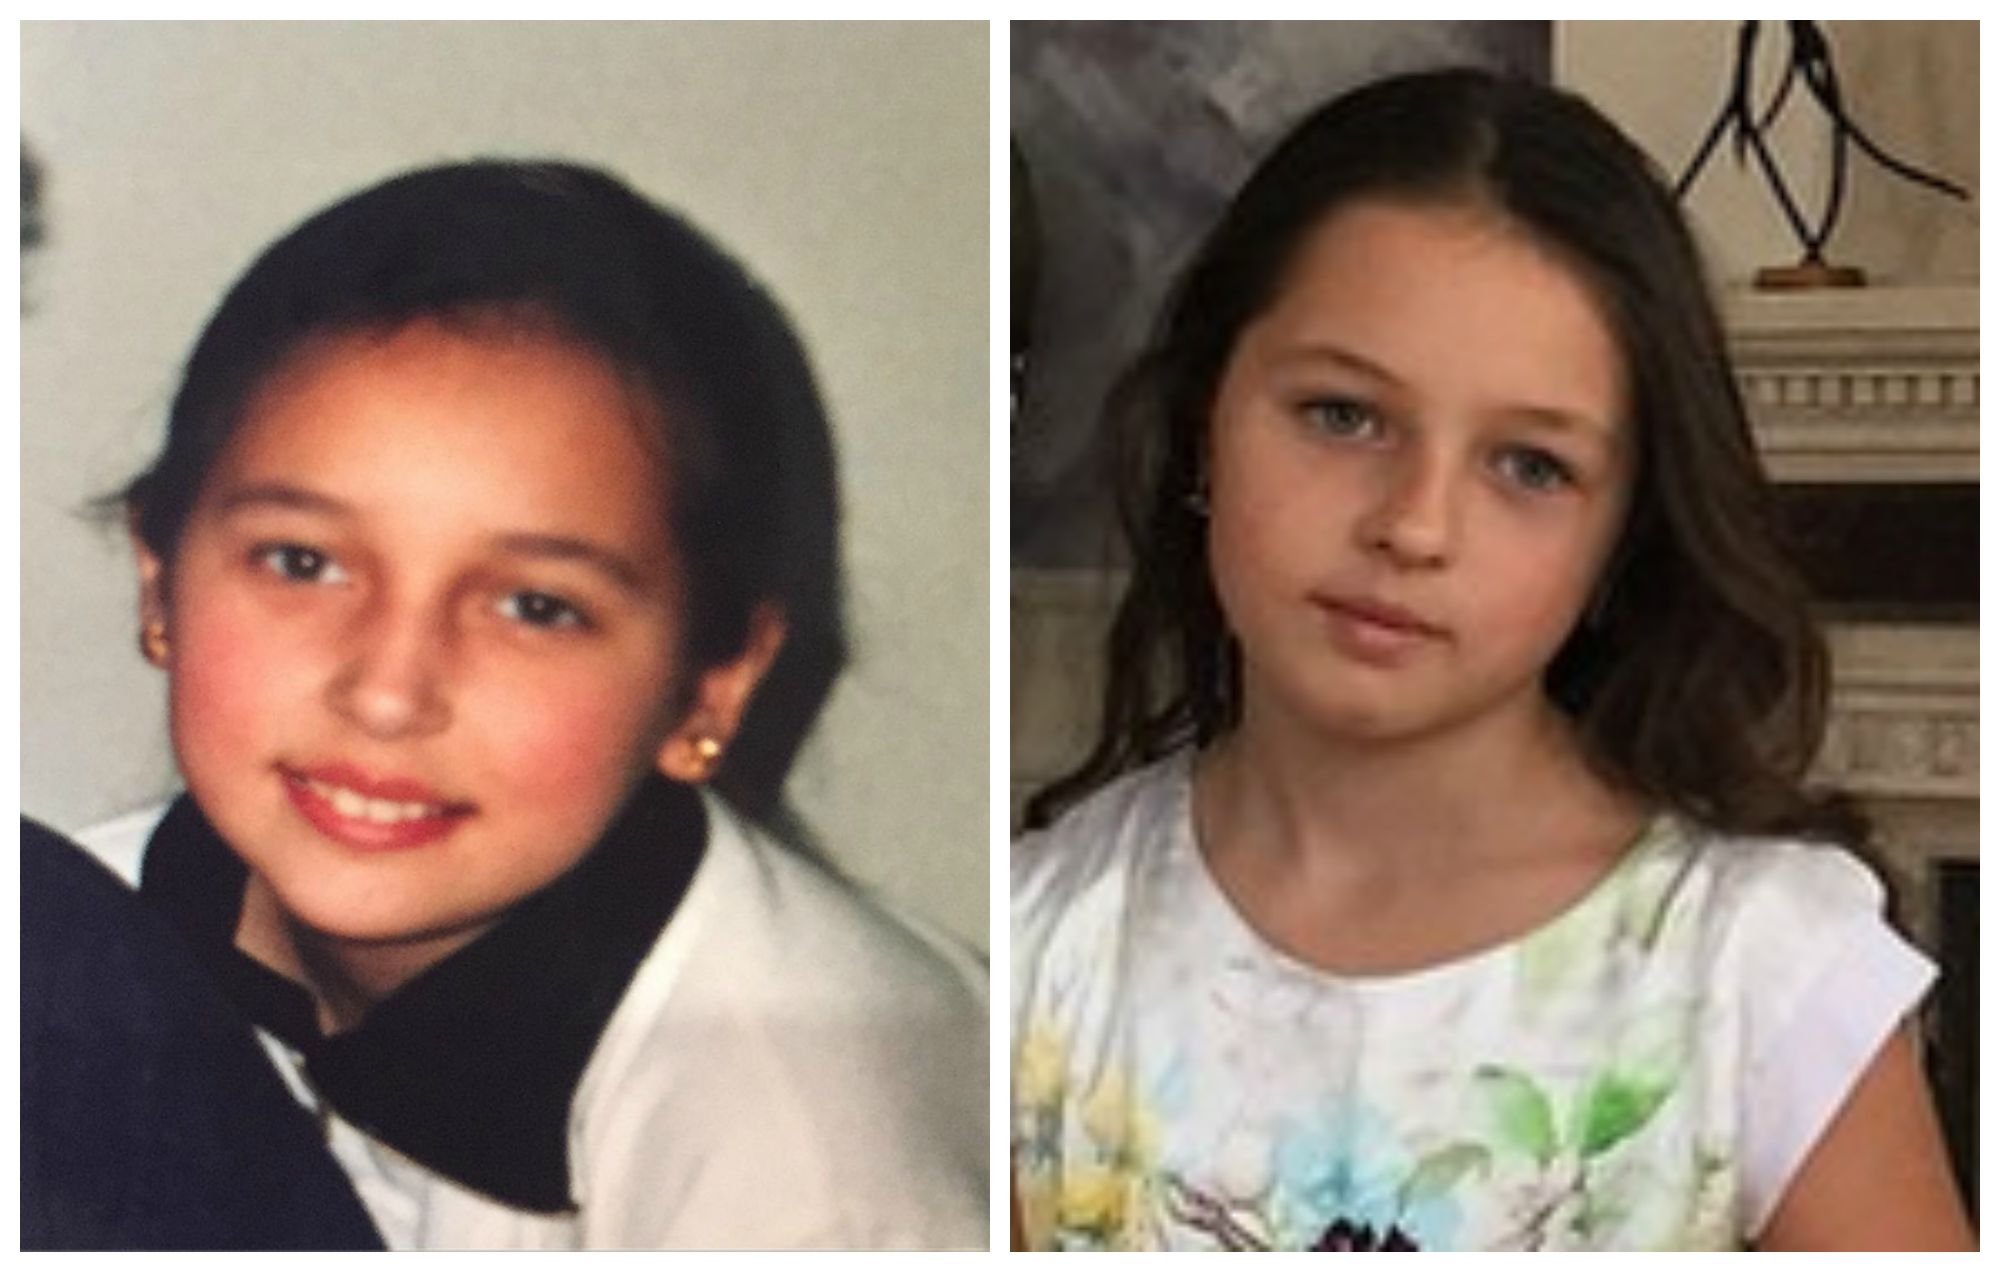 Певица Алсу в детстве (слева) и дочка Волочковой Ариадна (справа)